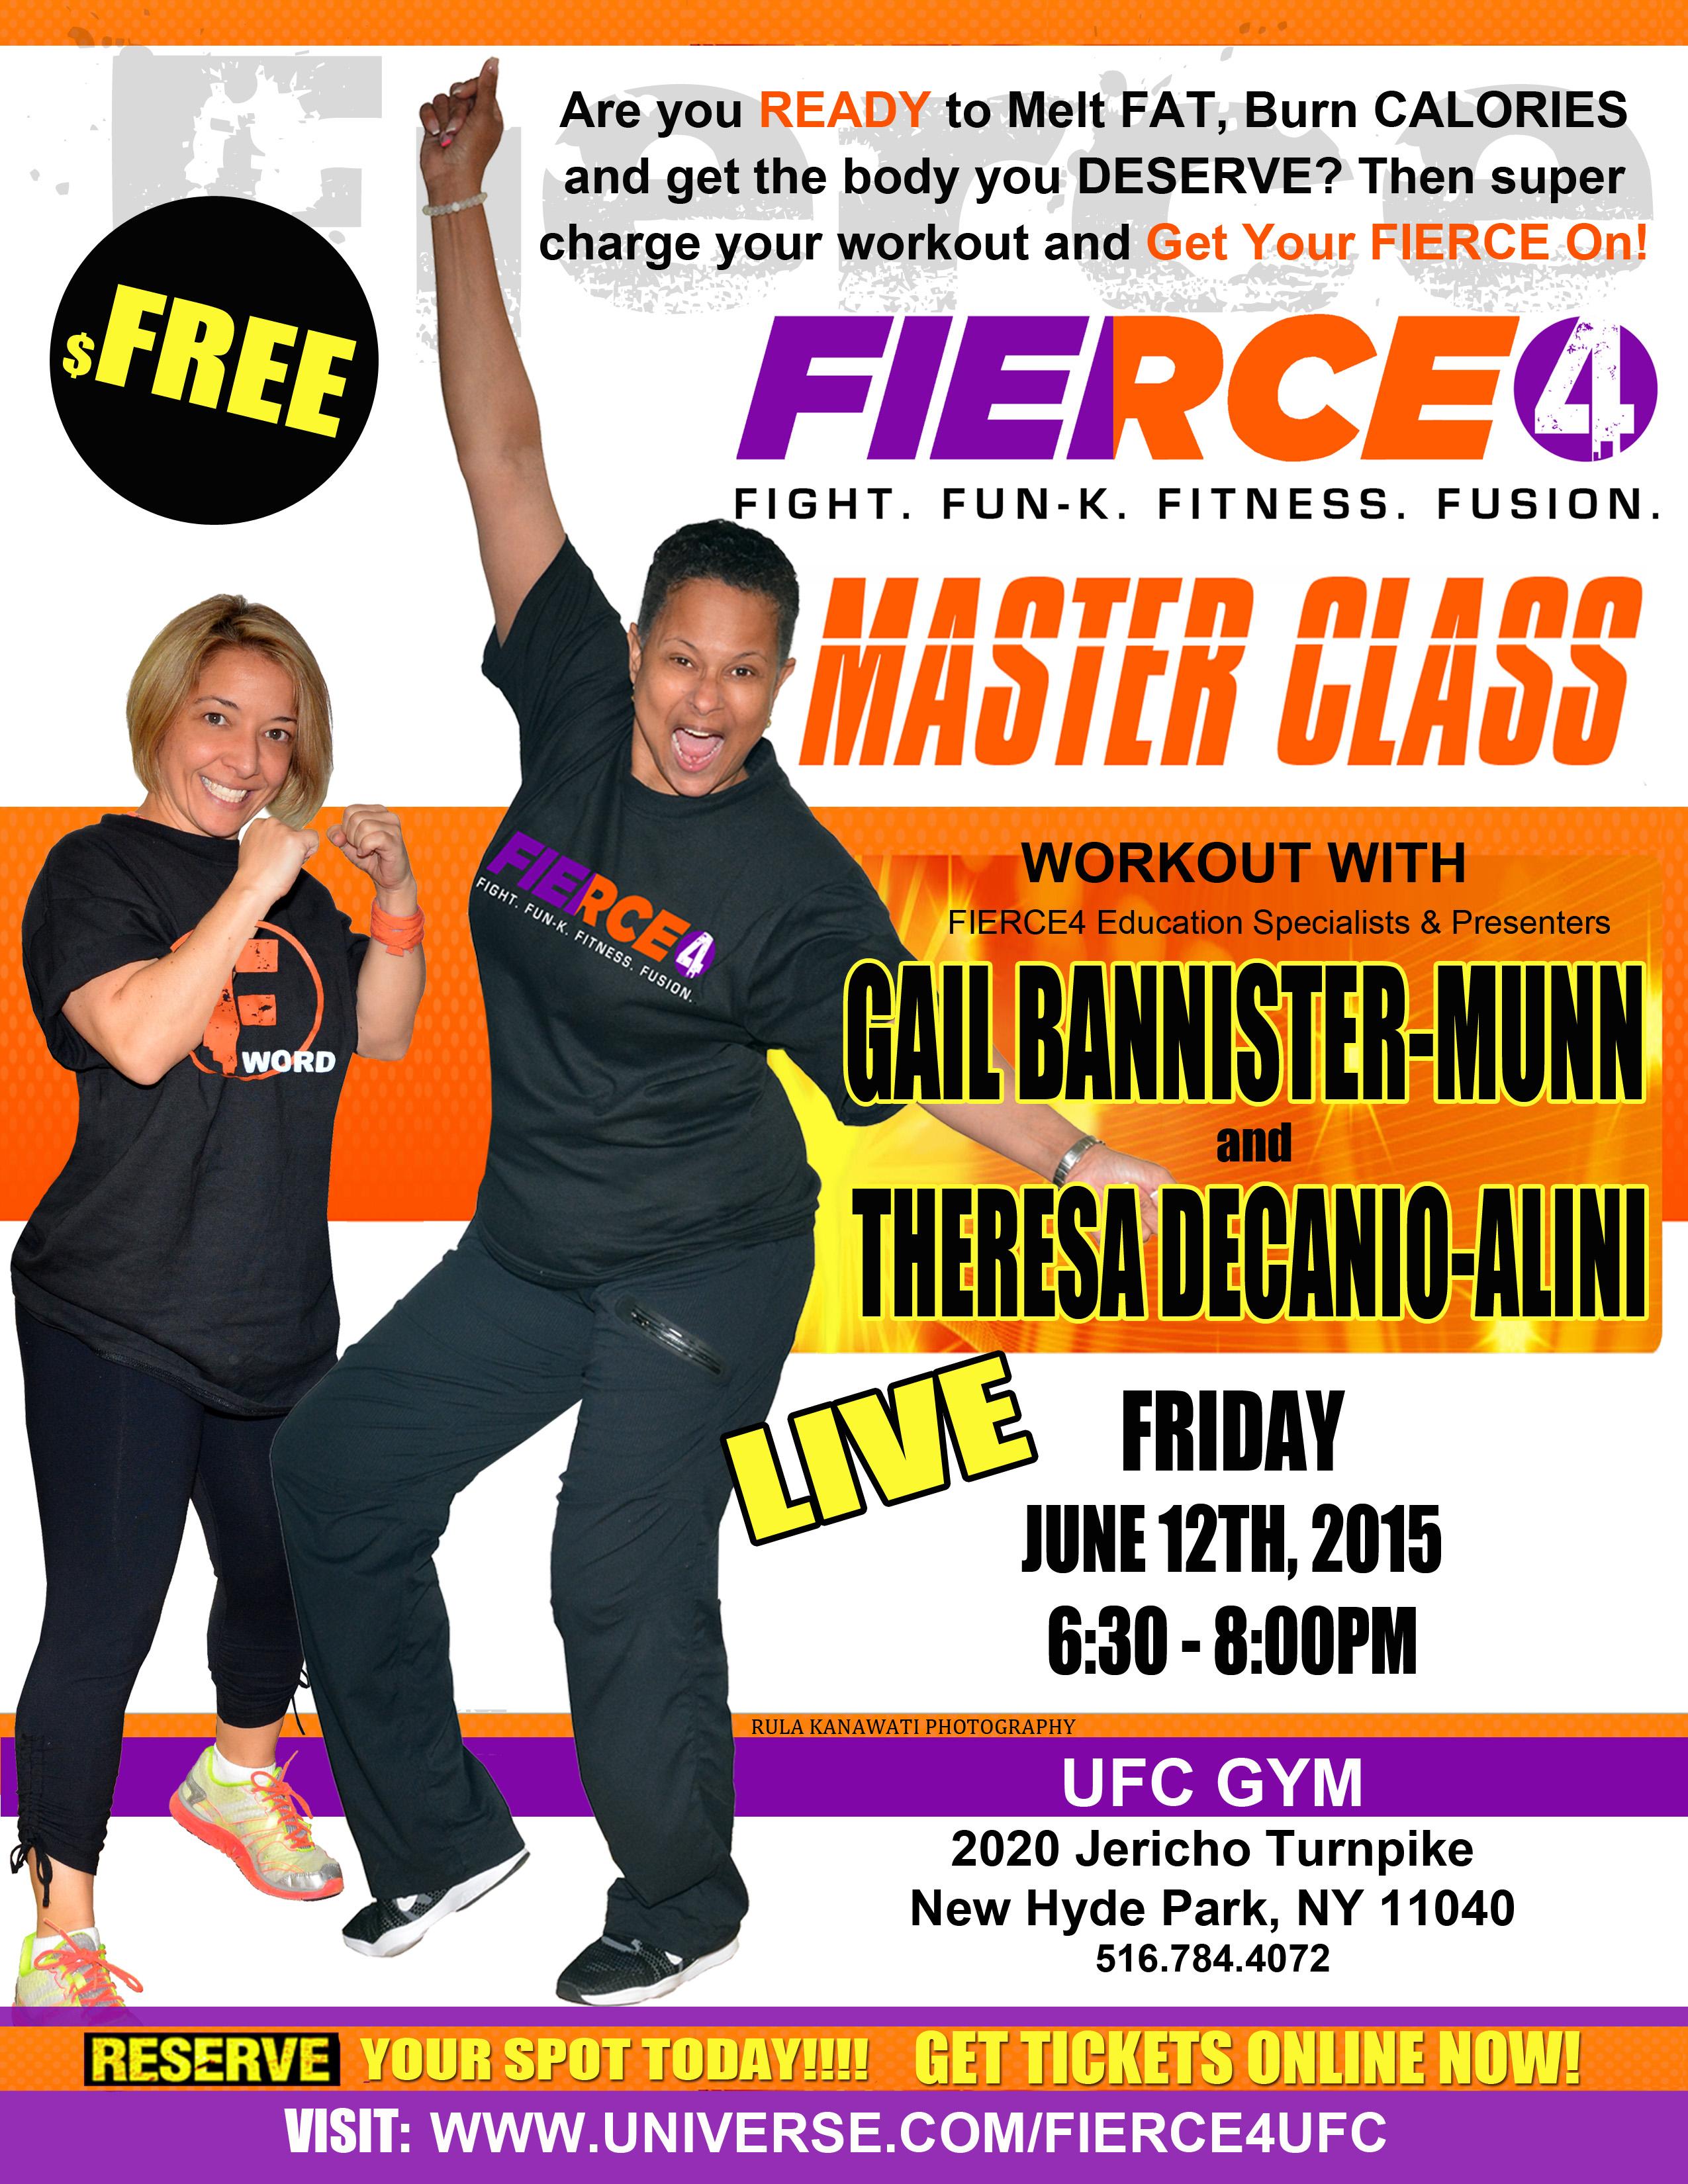 Fierce4 Master Class UFC Gym - Events - Universe